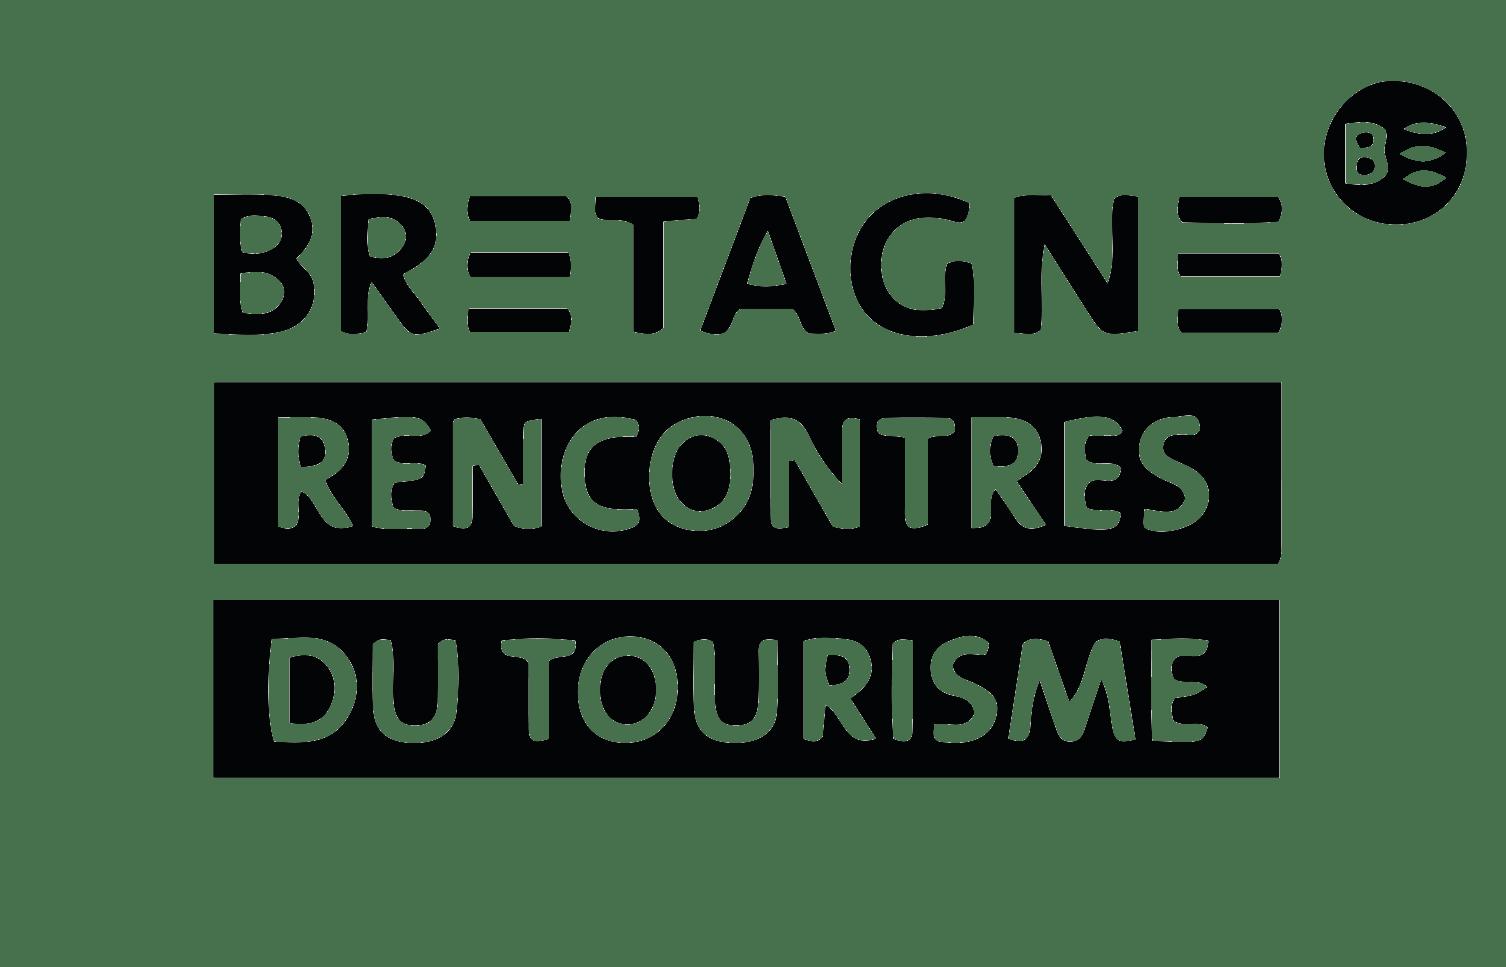 encontre Tourisme Bretagne